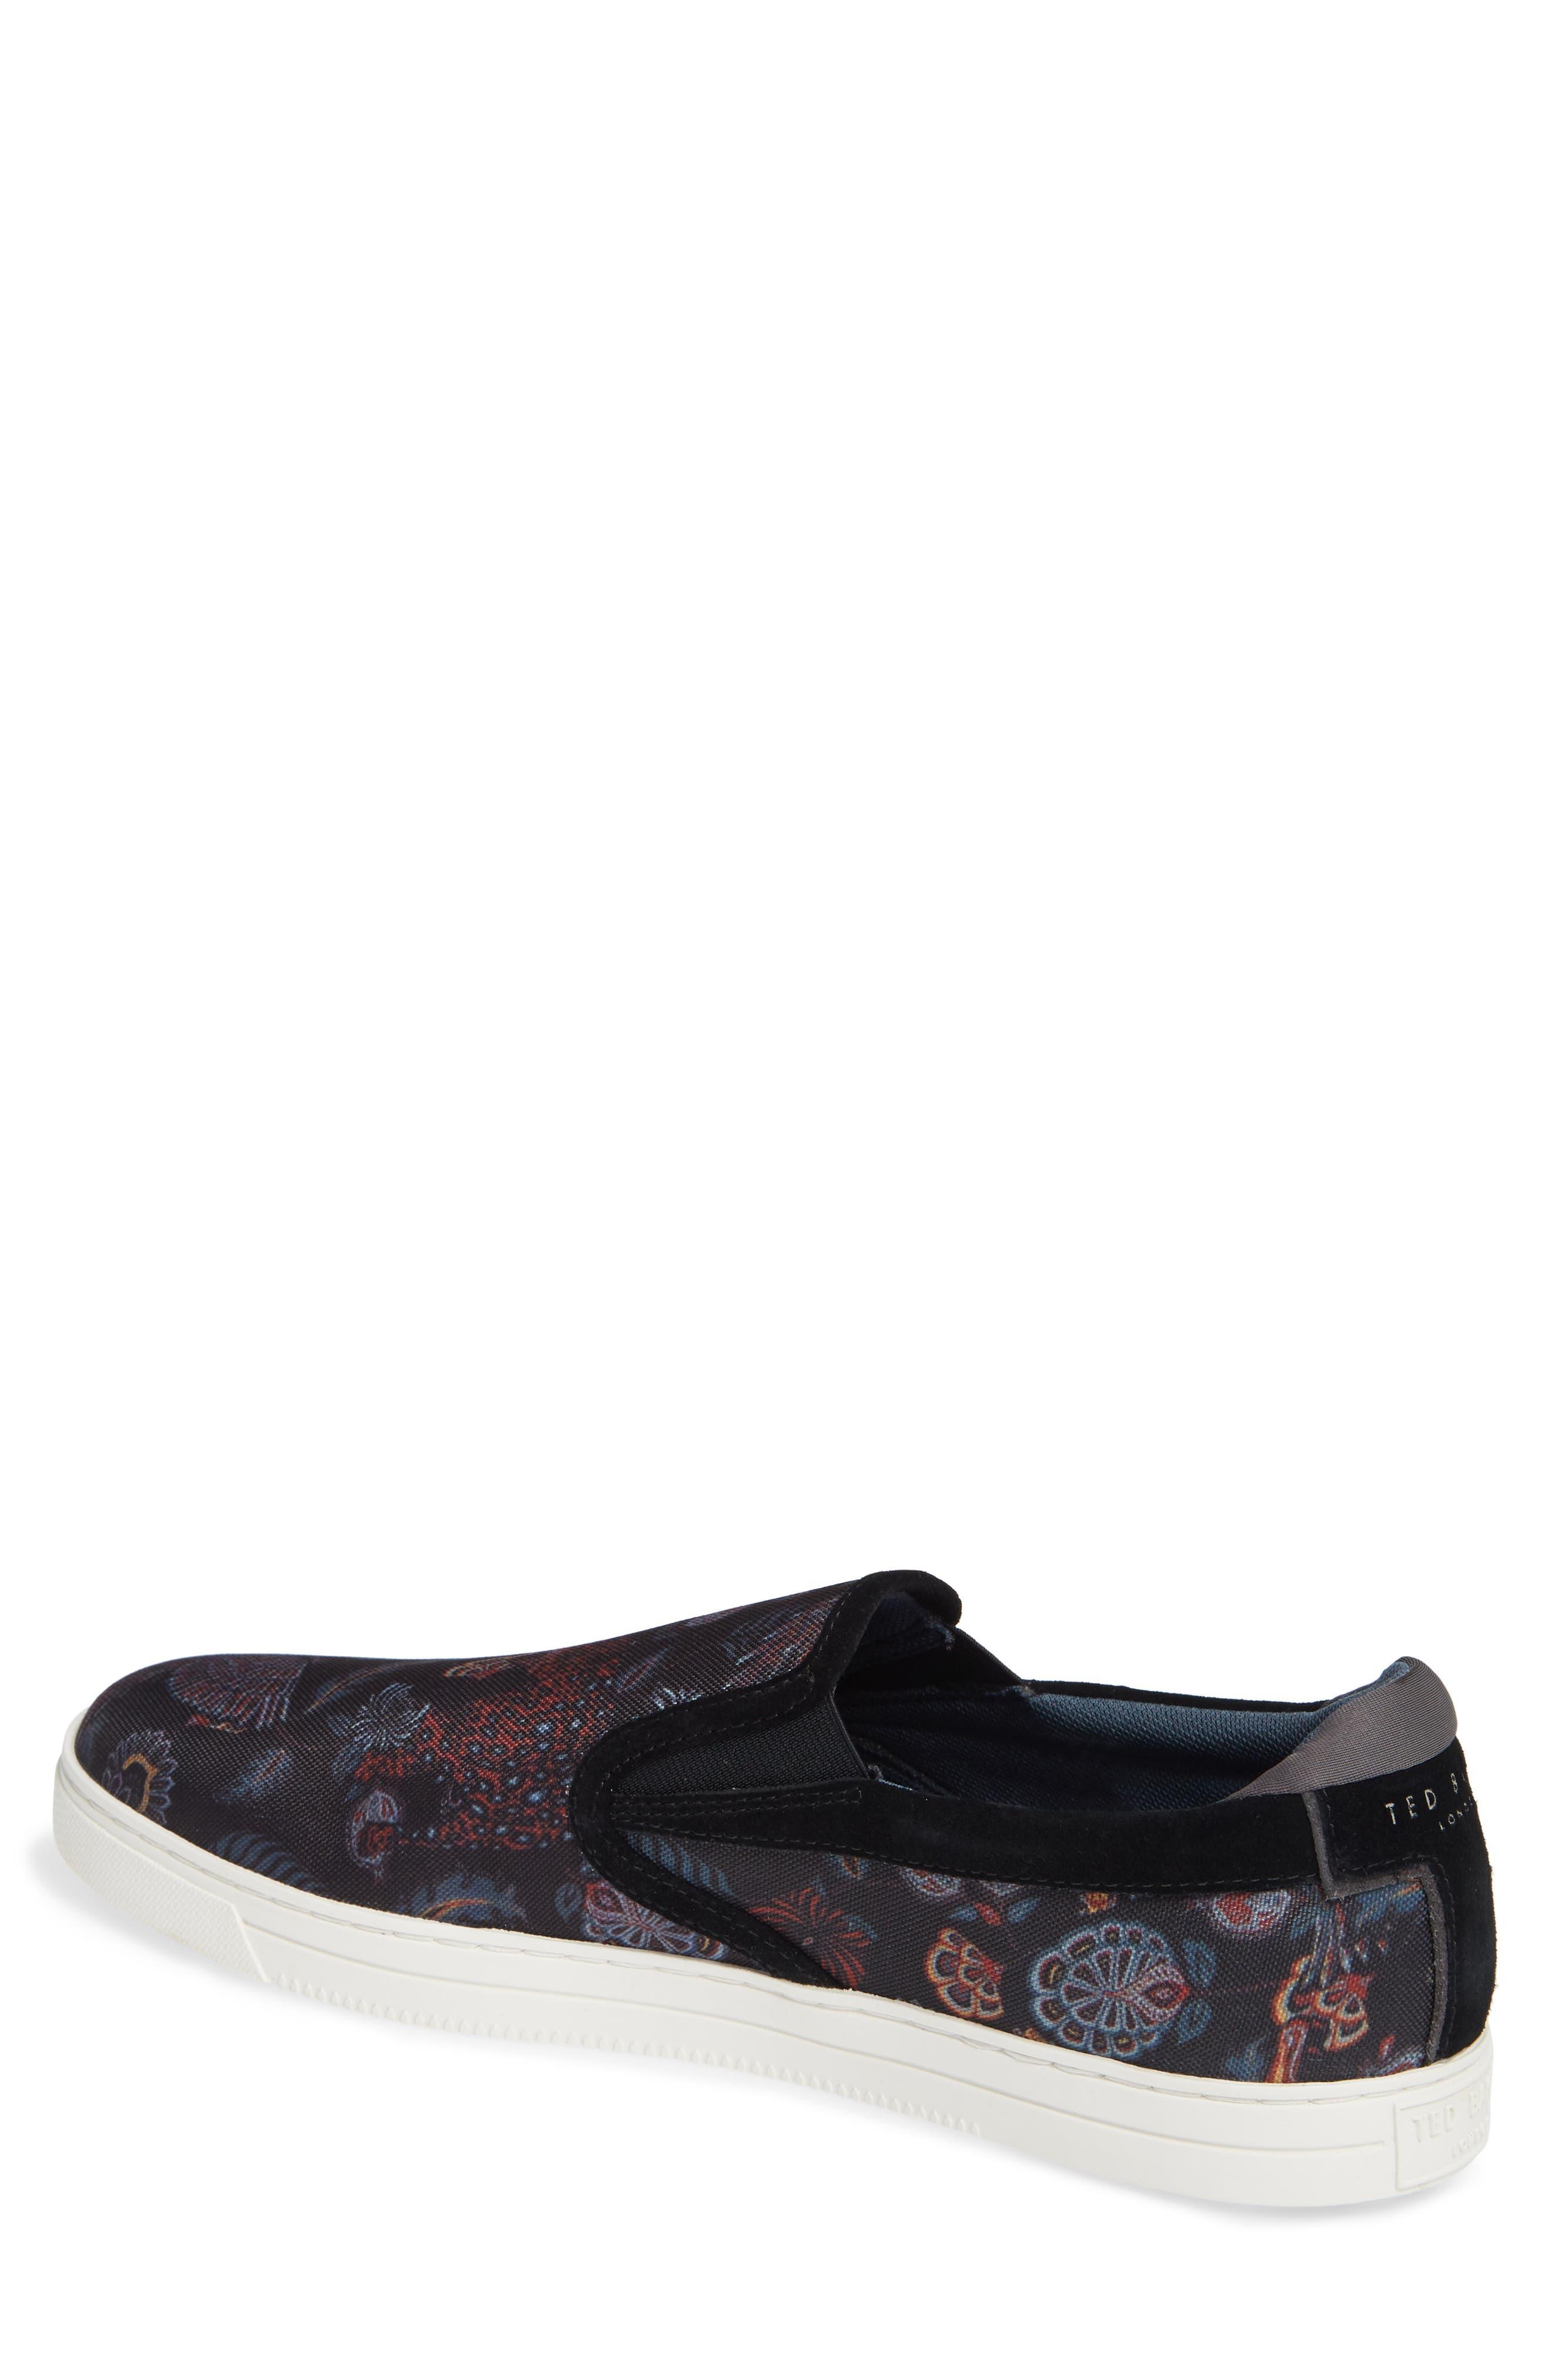 Mhako Slip-On Sneaker,                             Alternate thumbnail 2, color,                             BLACK/ GREY